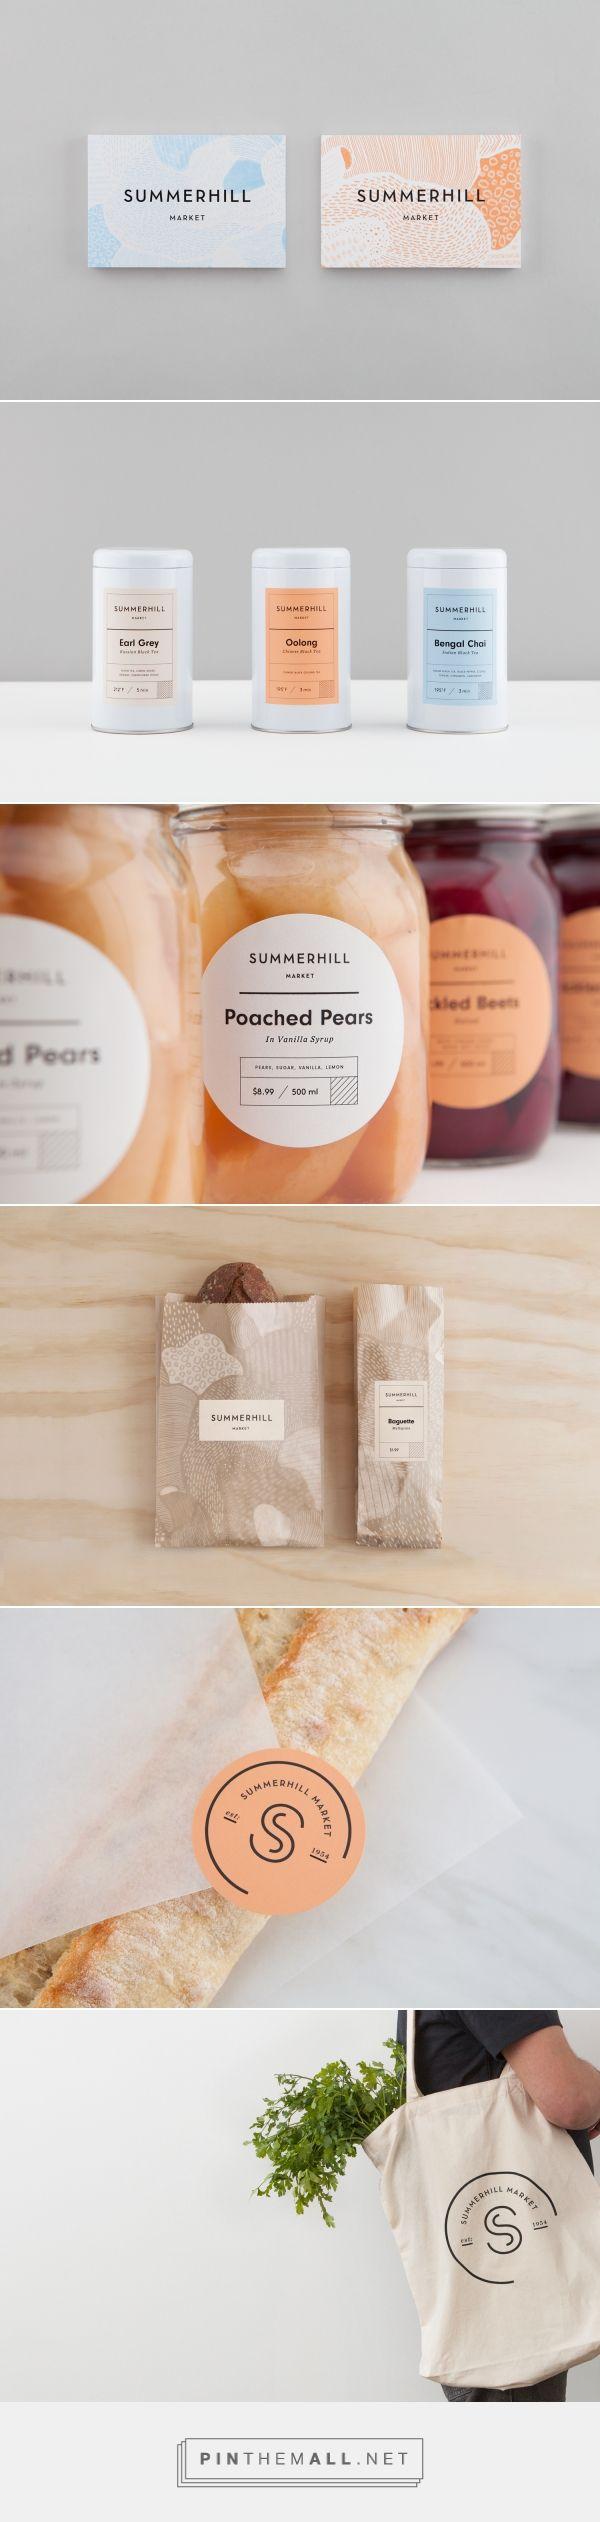 Summerhill market packaging